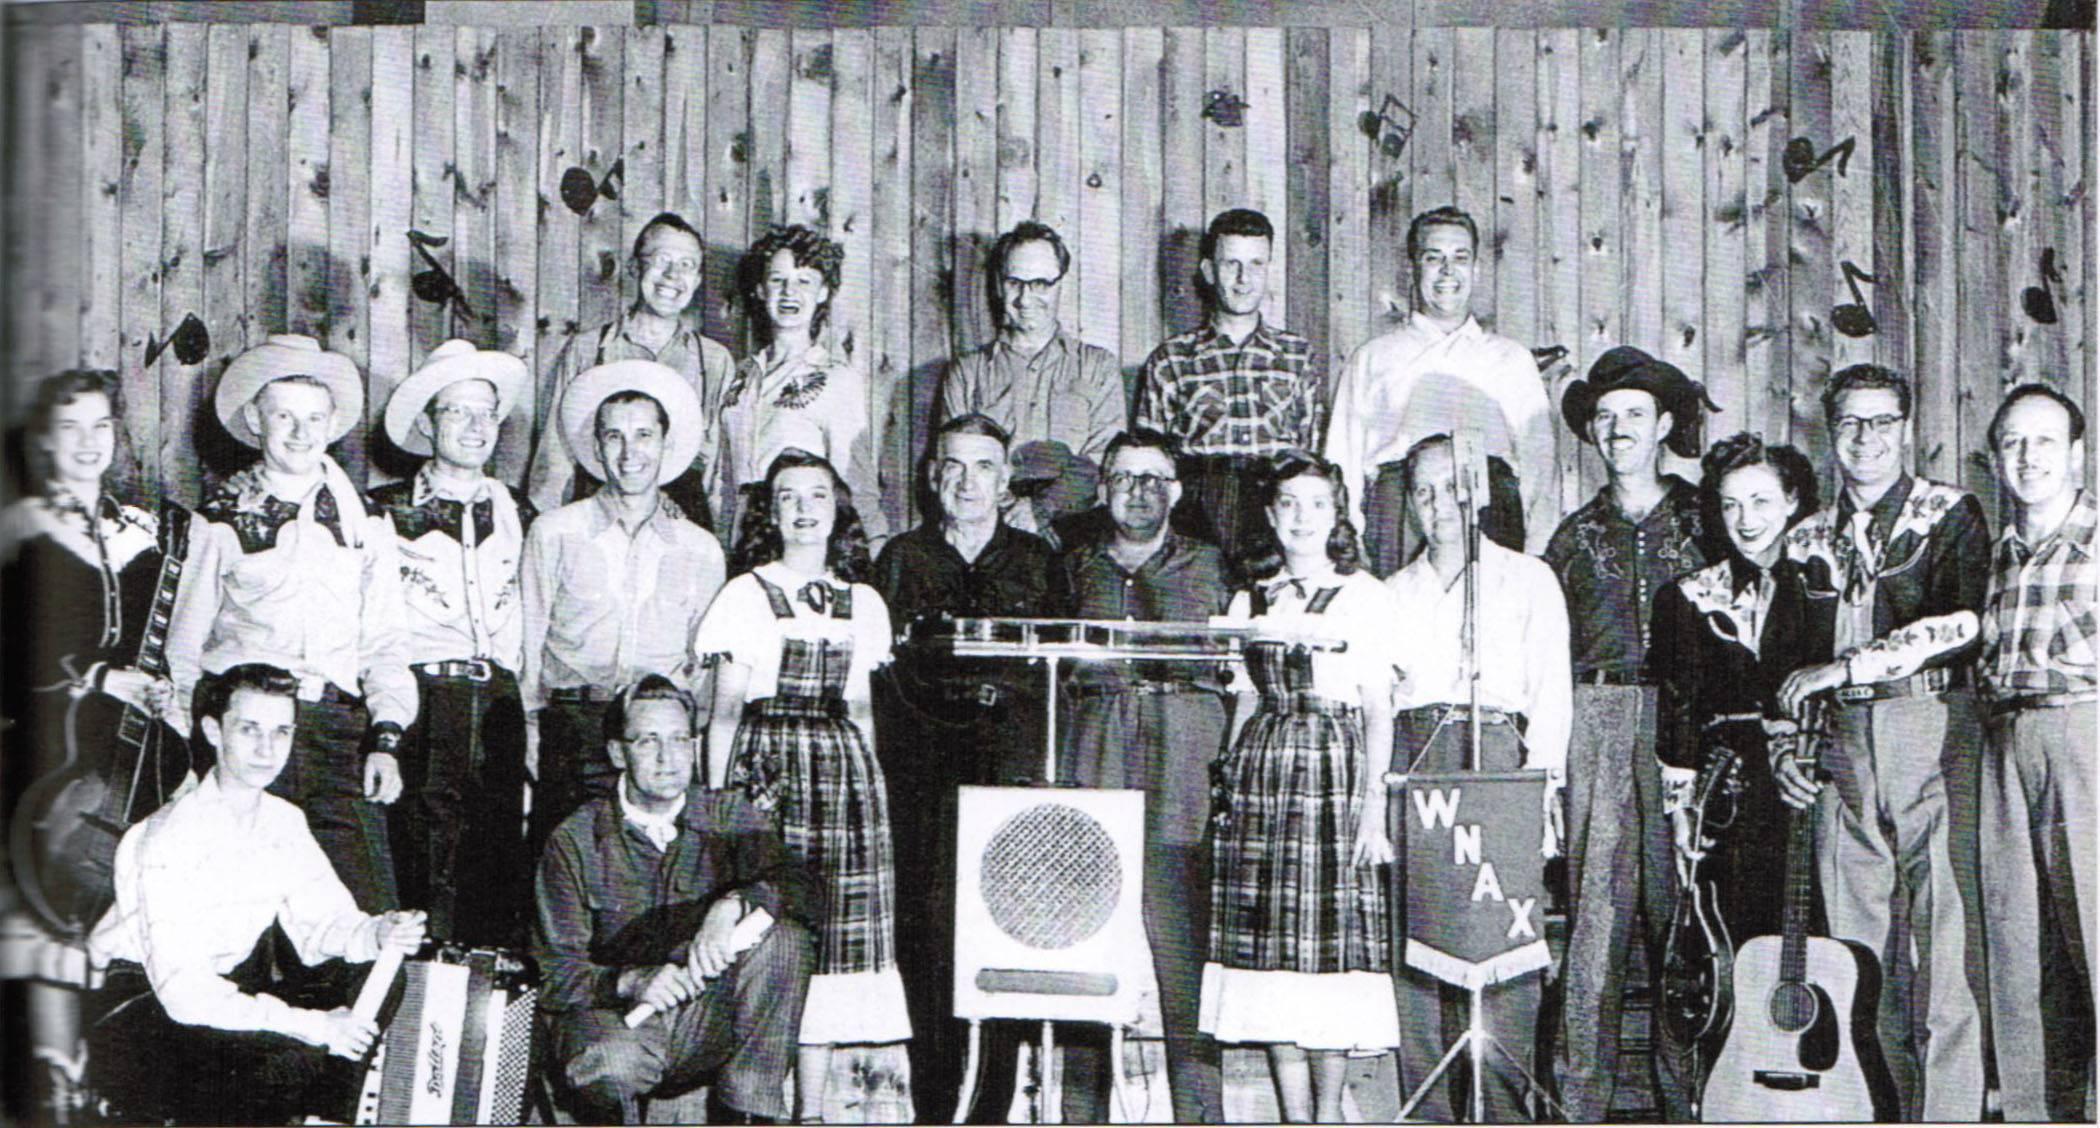 WNAX Missouri Valley Barn Dance